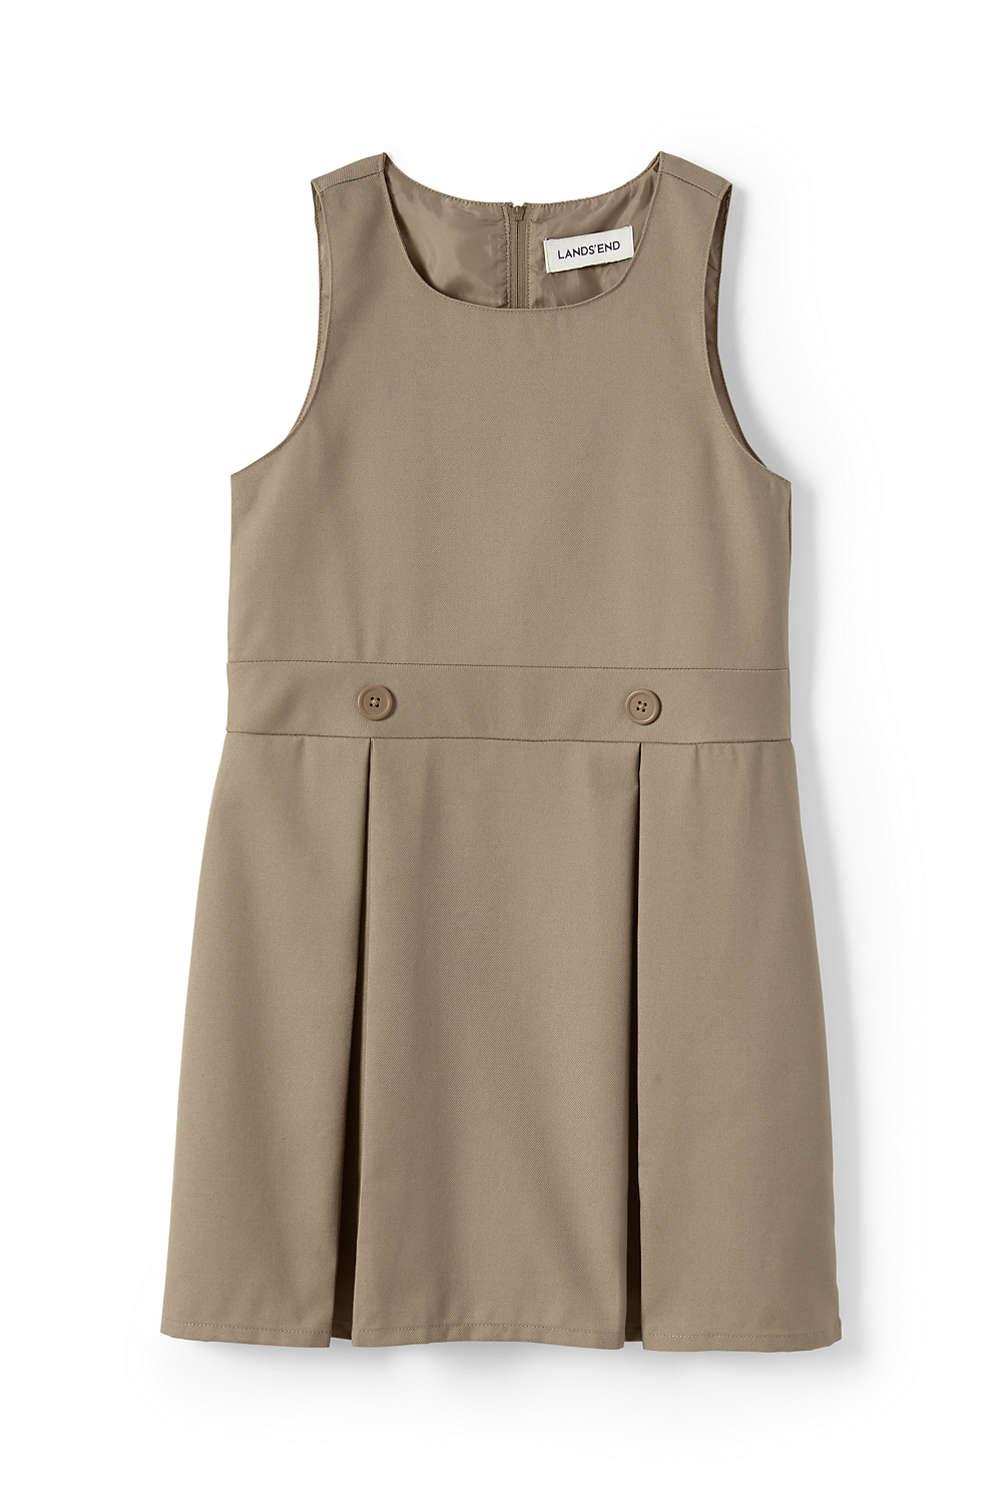 a87015382 School Uniform Girls Solid Jumper from Lands' End